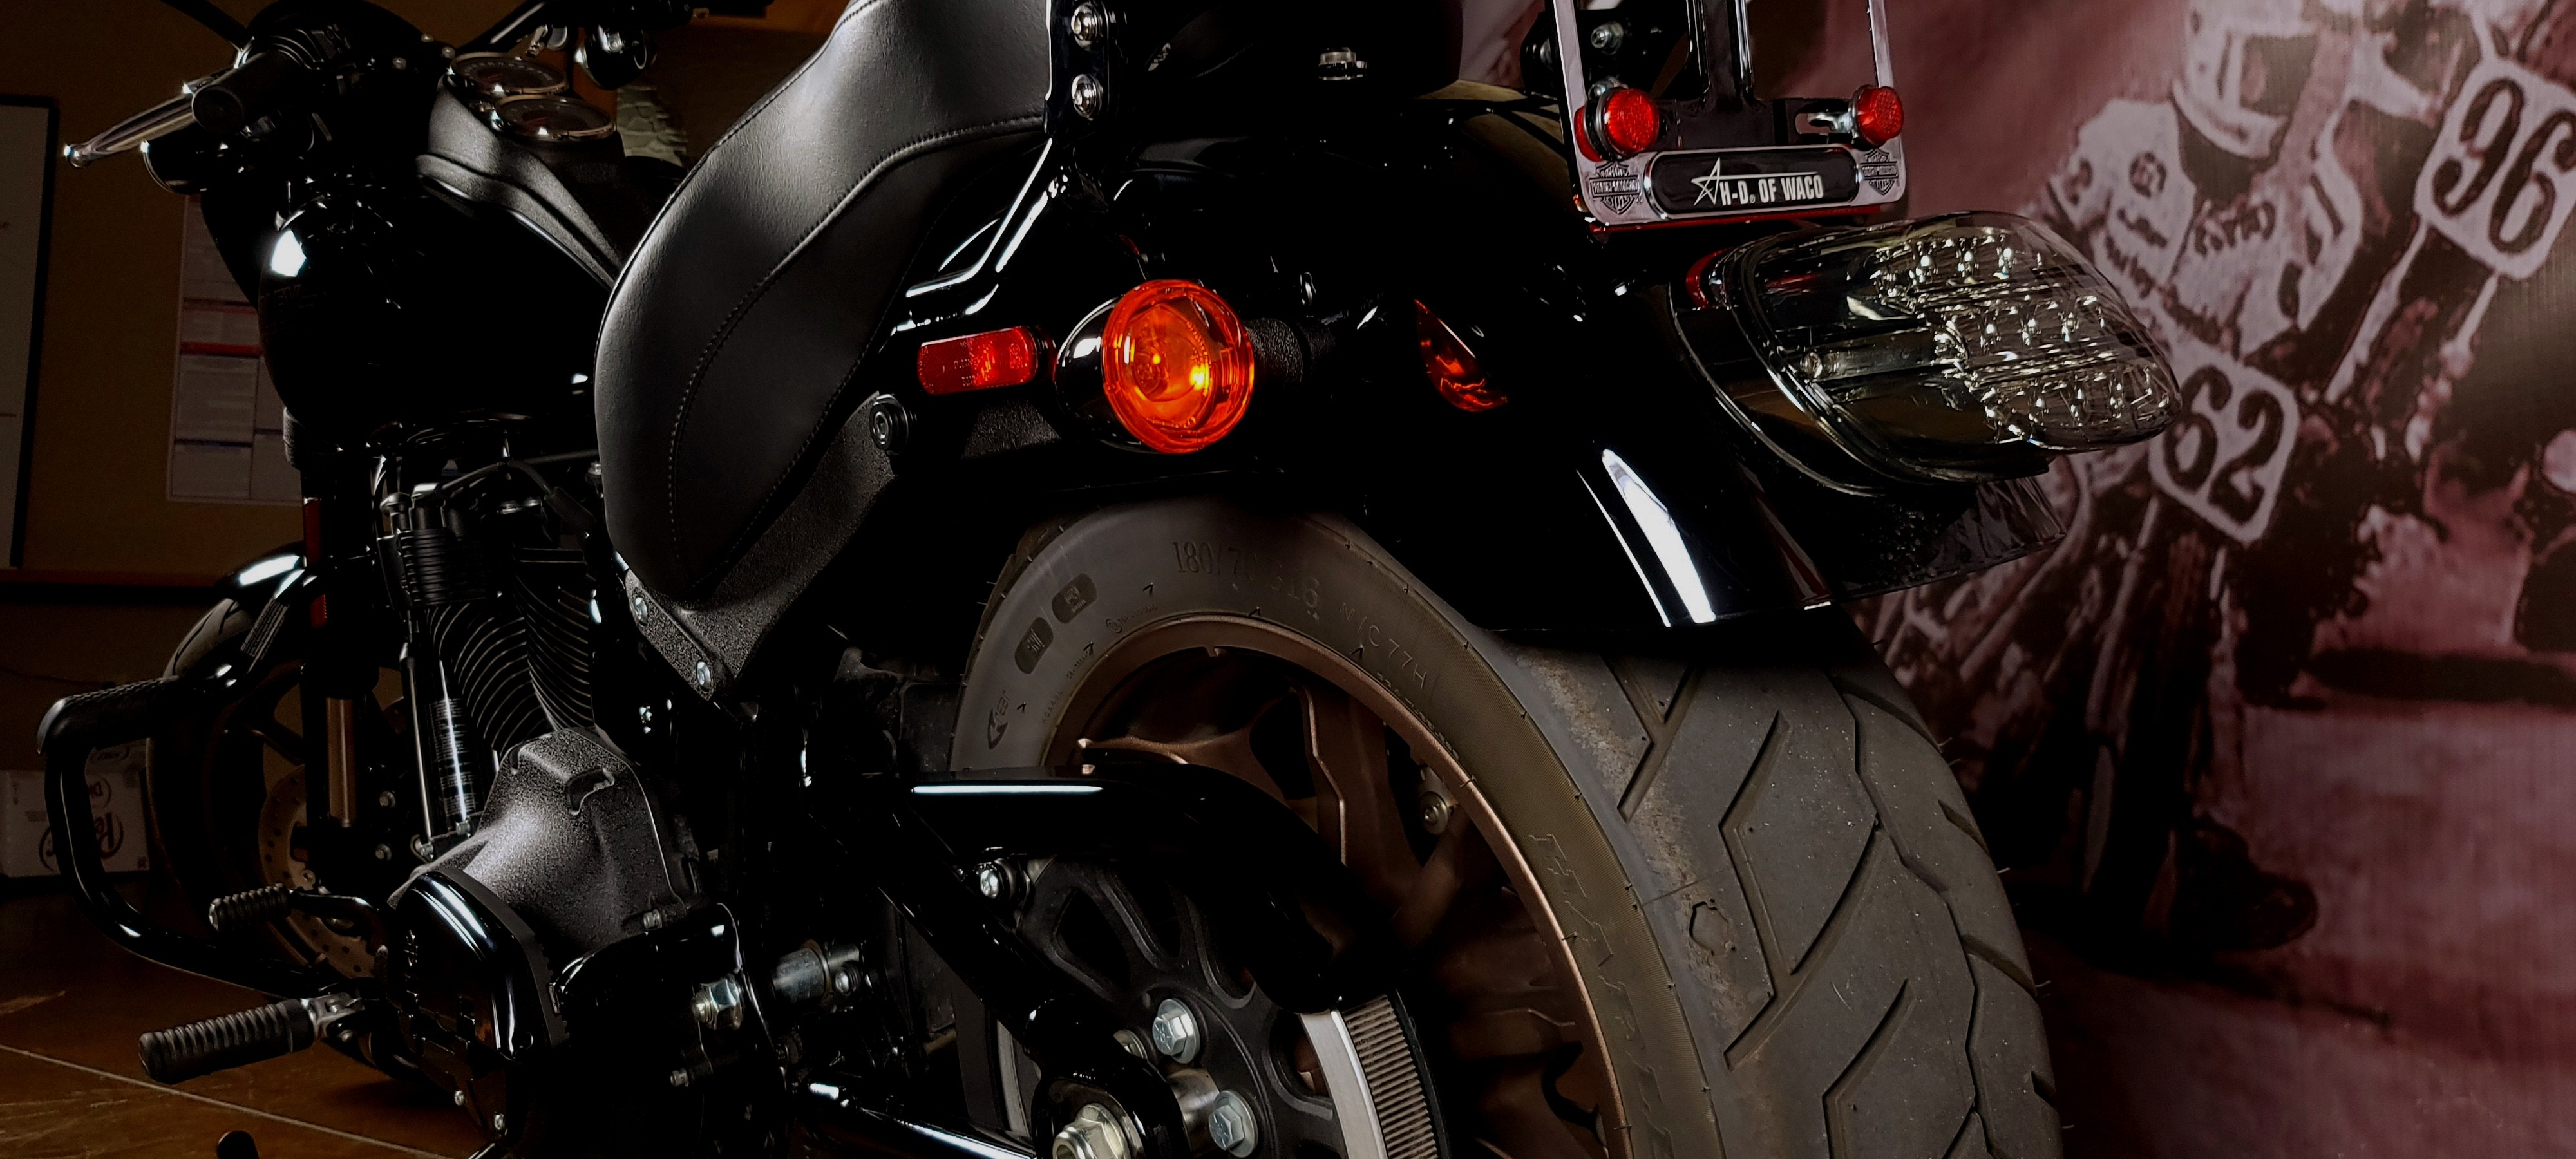 2020 Harley-Davidson Softail Low Rider S at Harley-Davidson of Waco